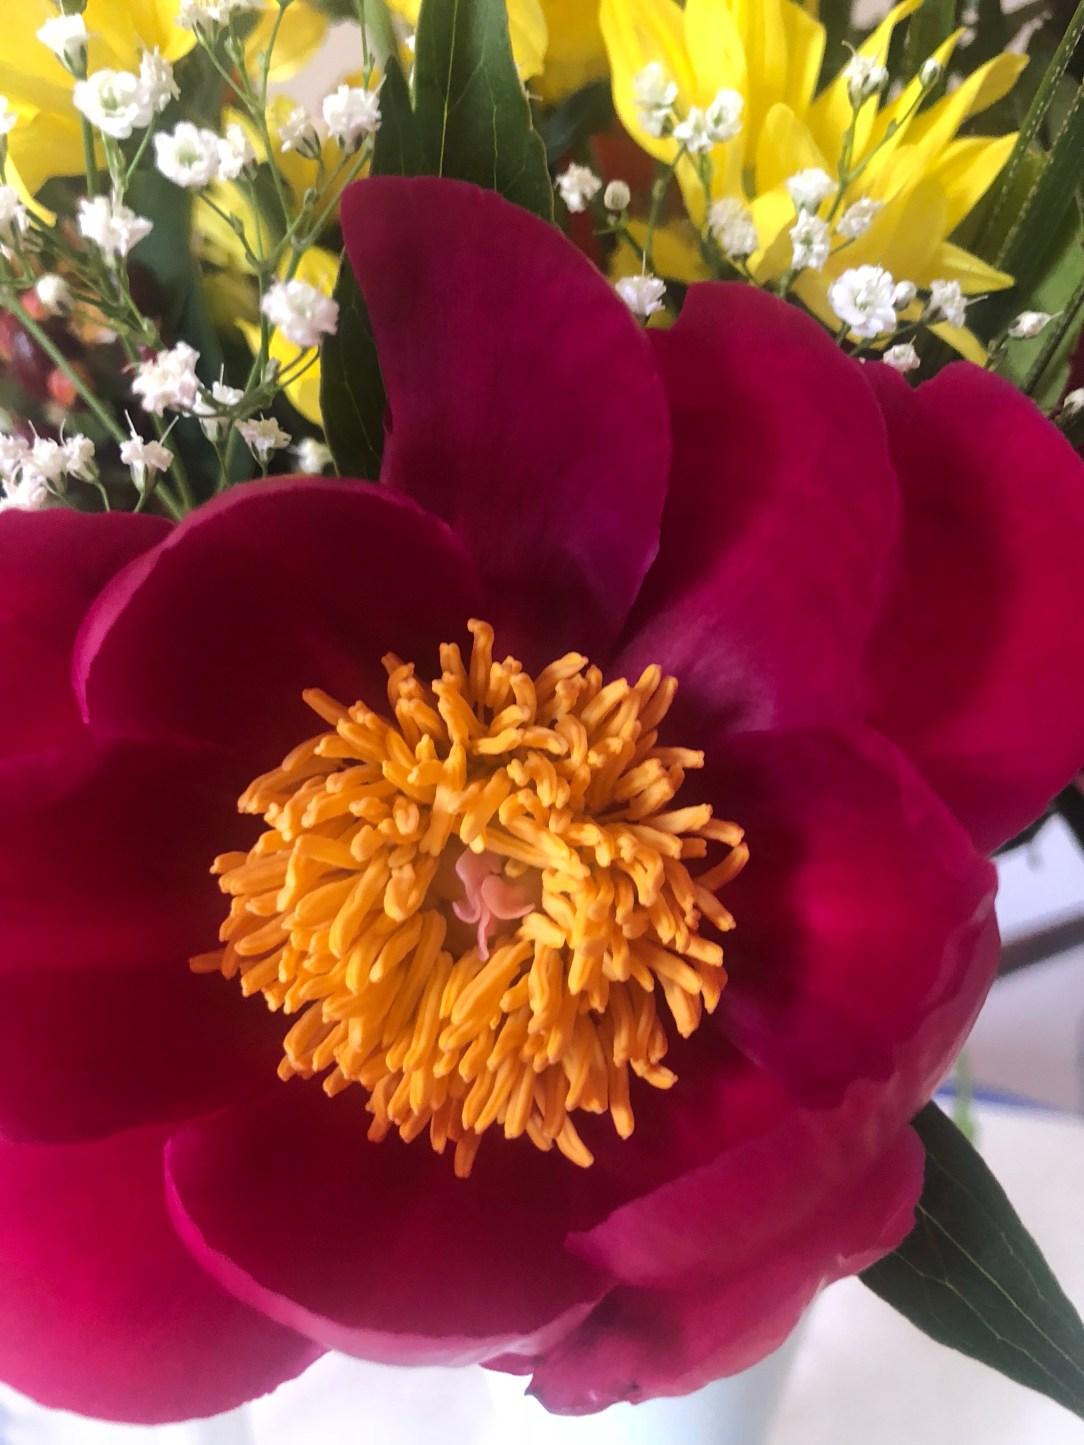 Magali Themouse, quinqua, 50 ans, soleil, sunny monday, fleurs, jaune, orage